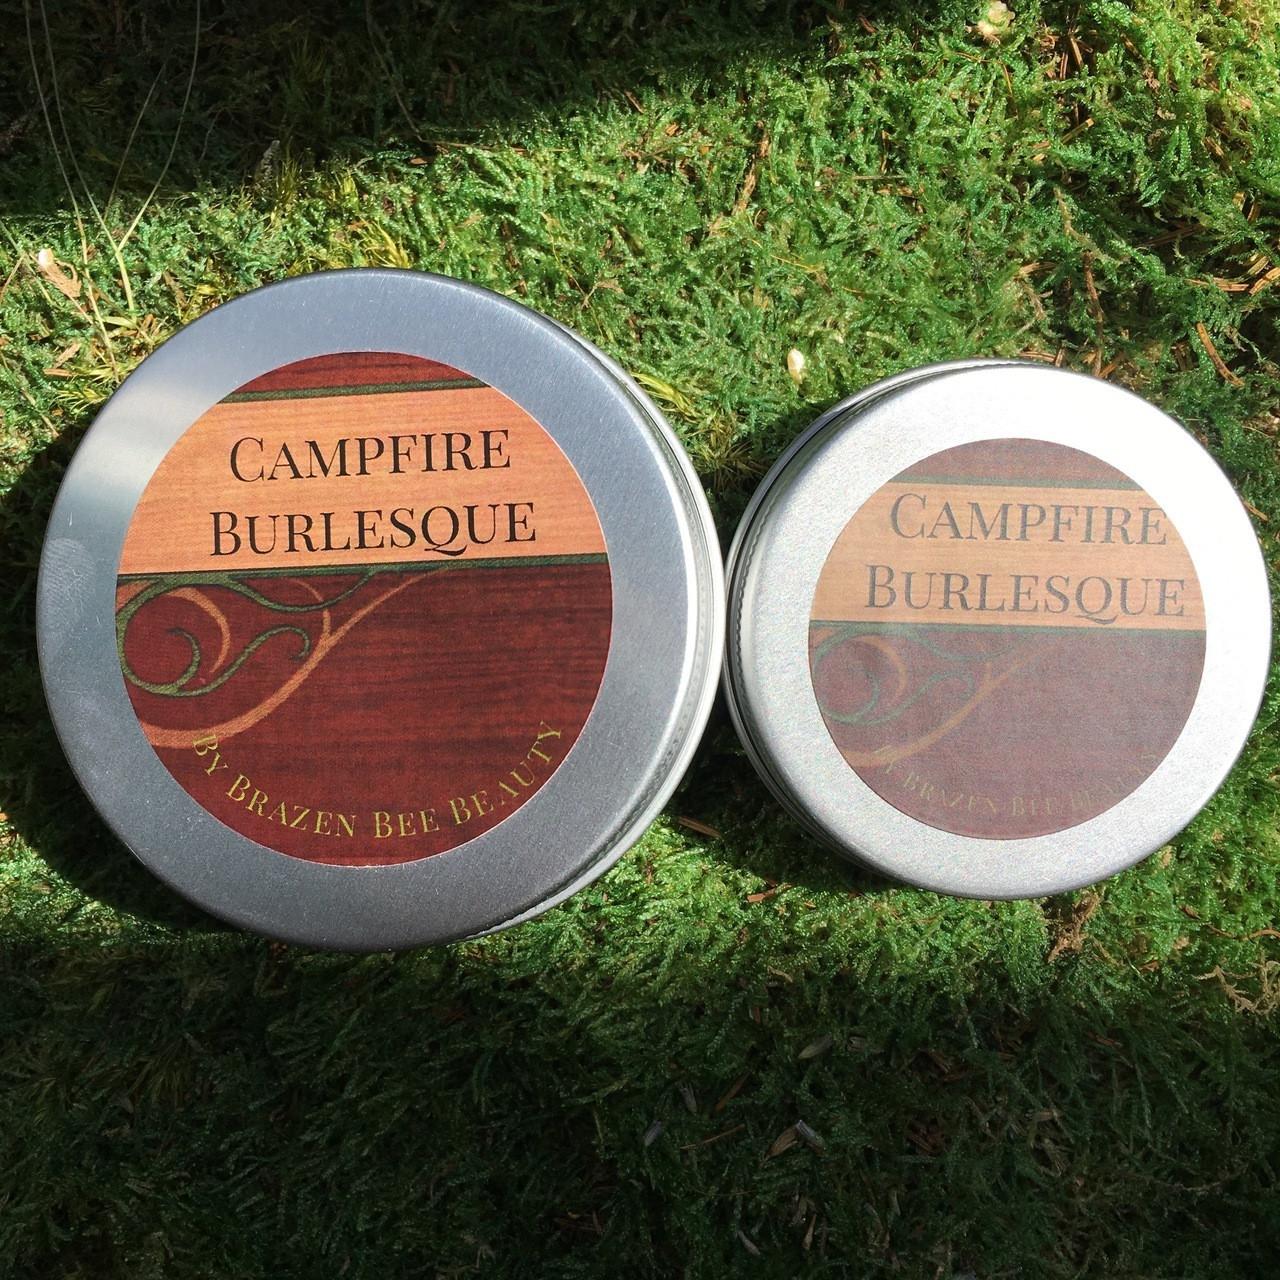 Campfire Burlesque Lotion: Whipped Argan